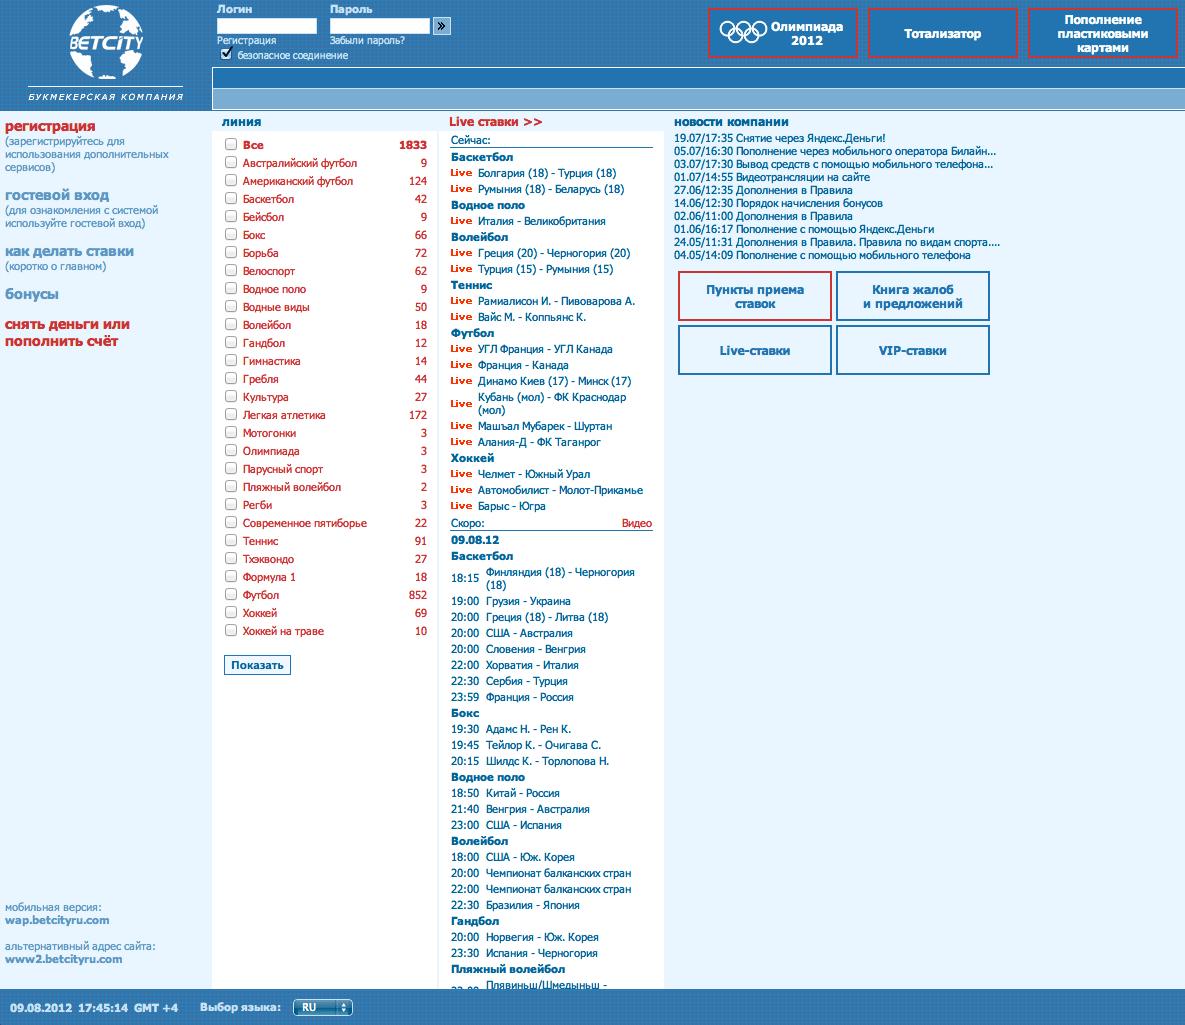 Лучший сайт для ставок на спорт онлайн